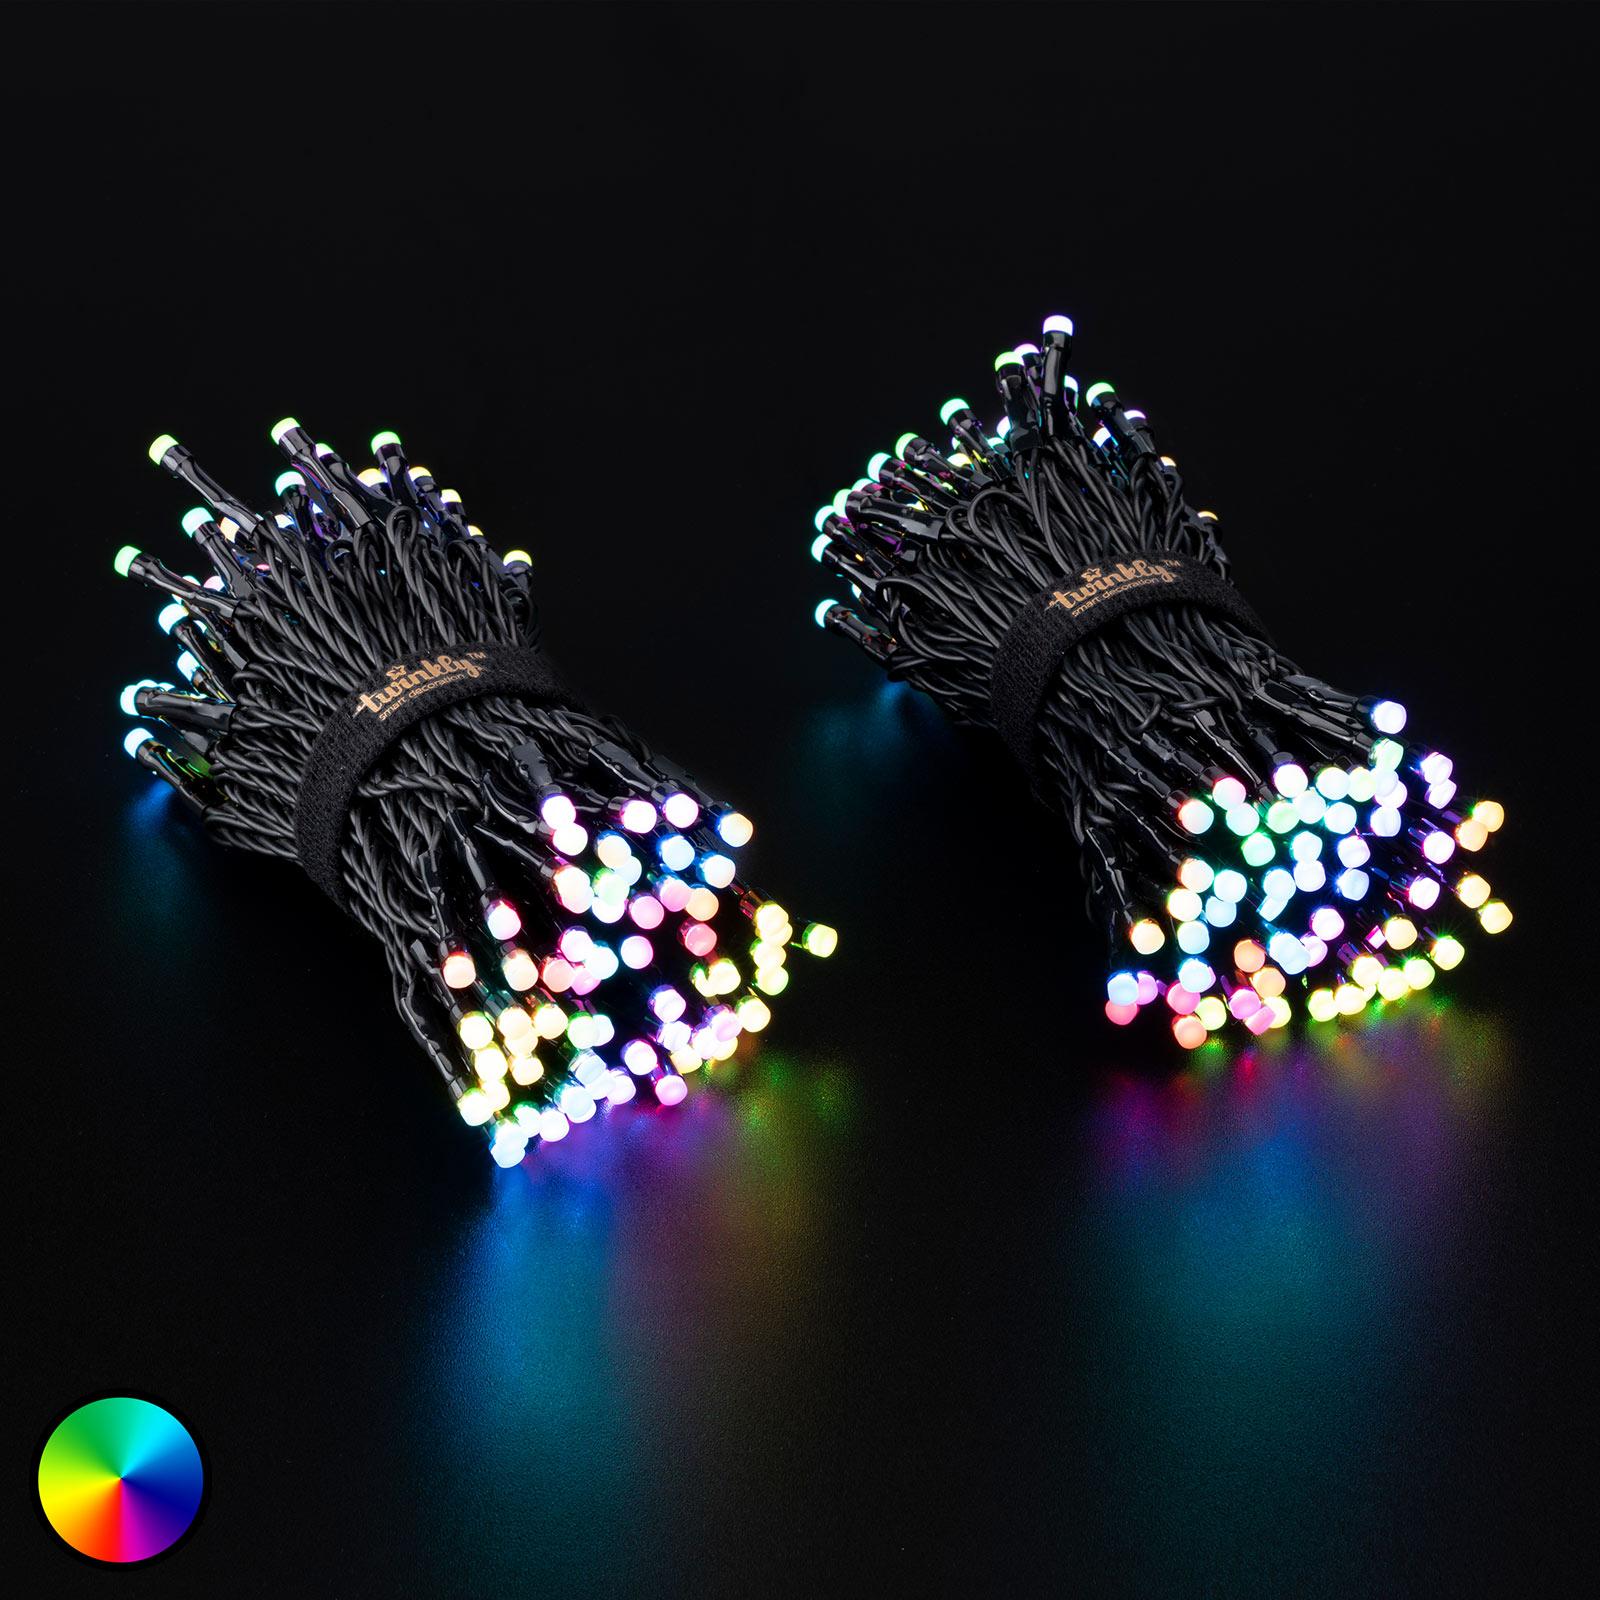 Lichtketting Twinkly RGB, zwart, 250-lamps 20m